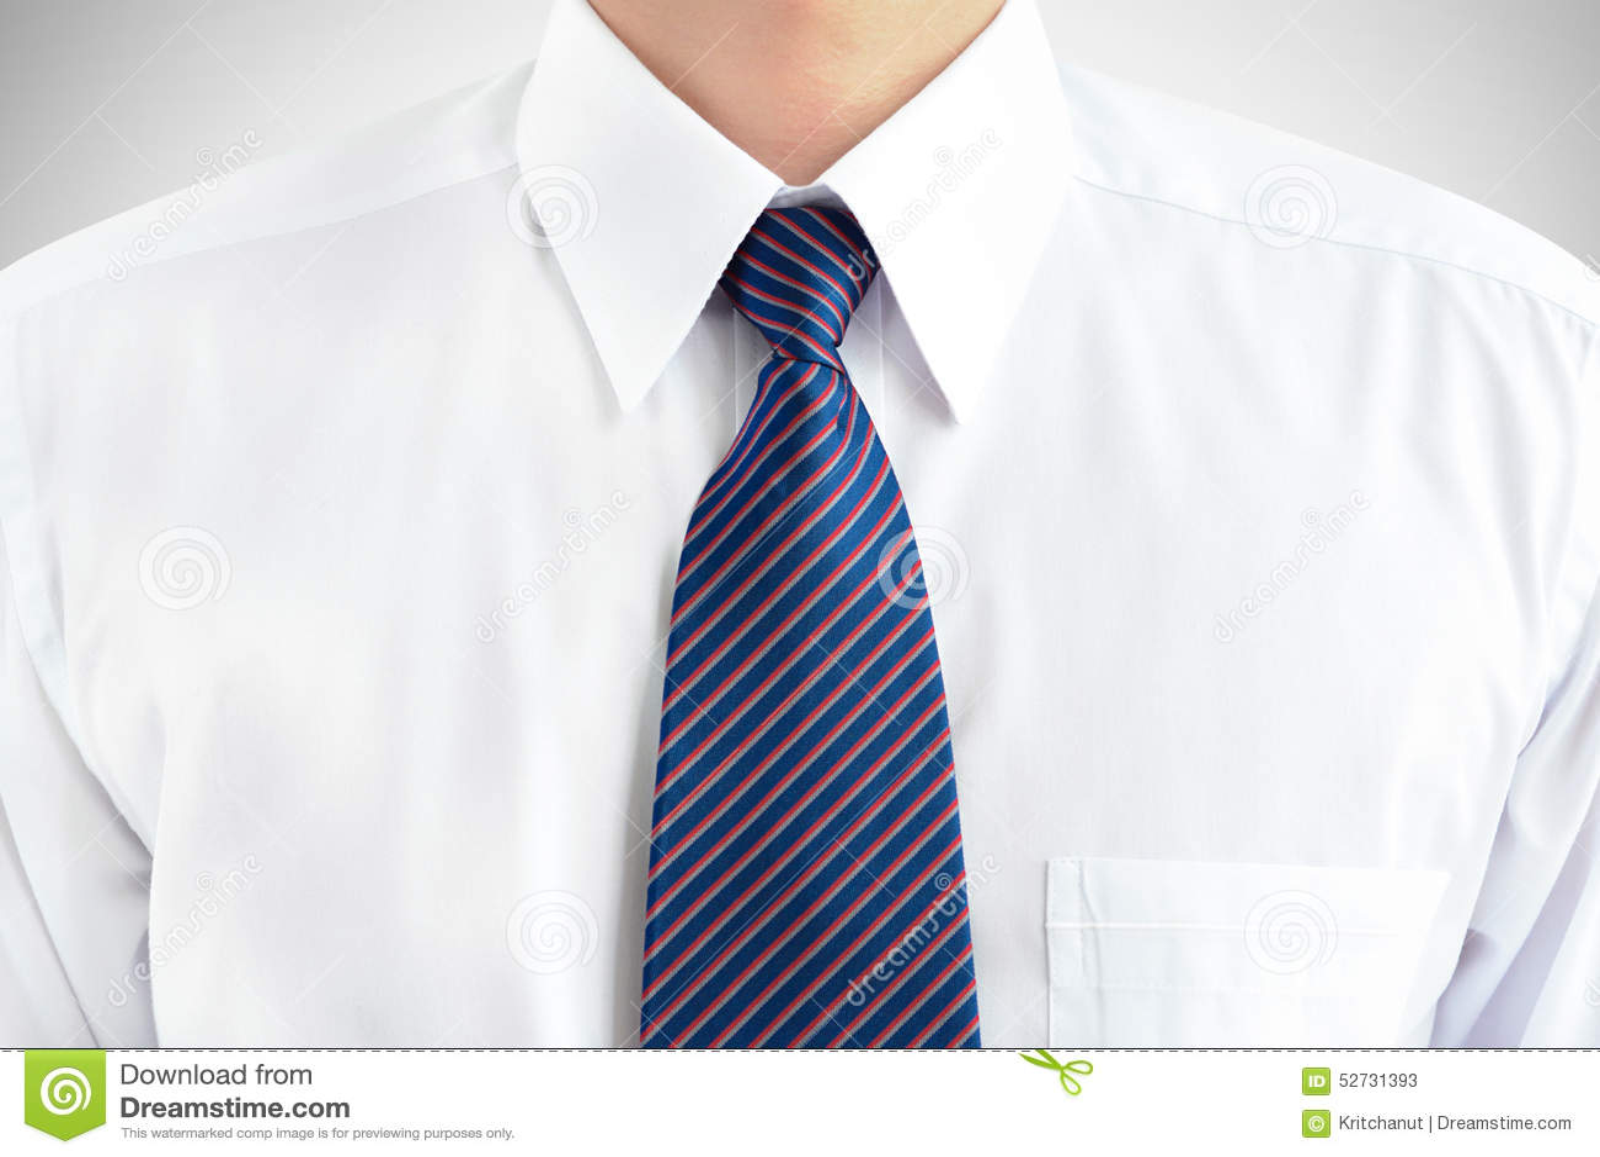 Person Wearing Formal Shirt